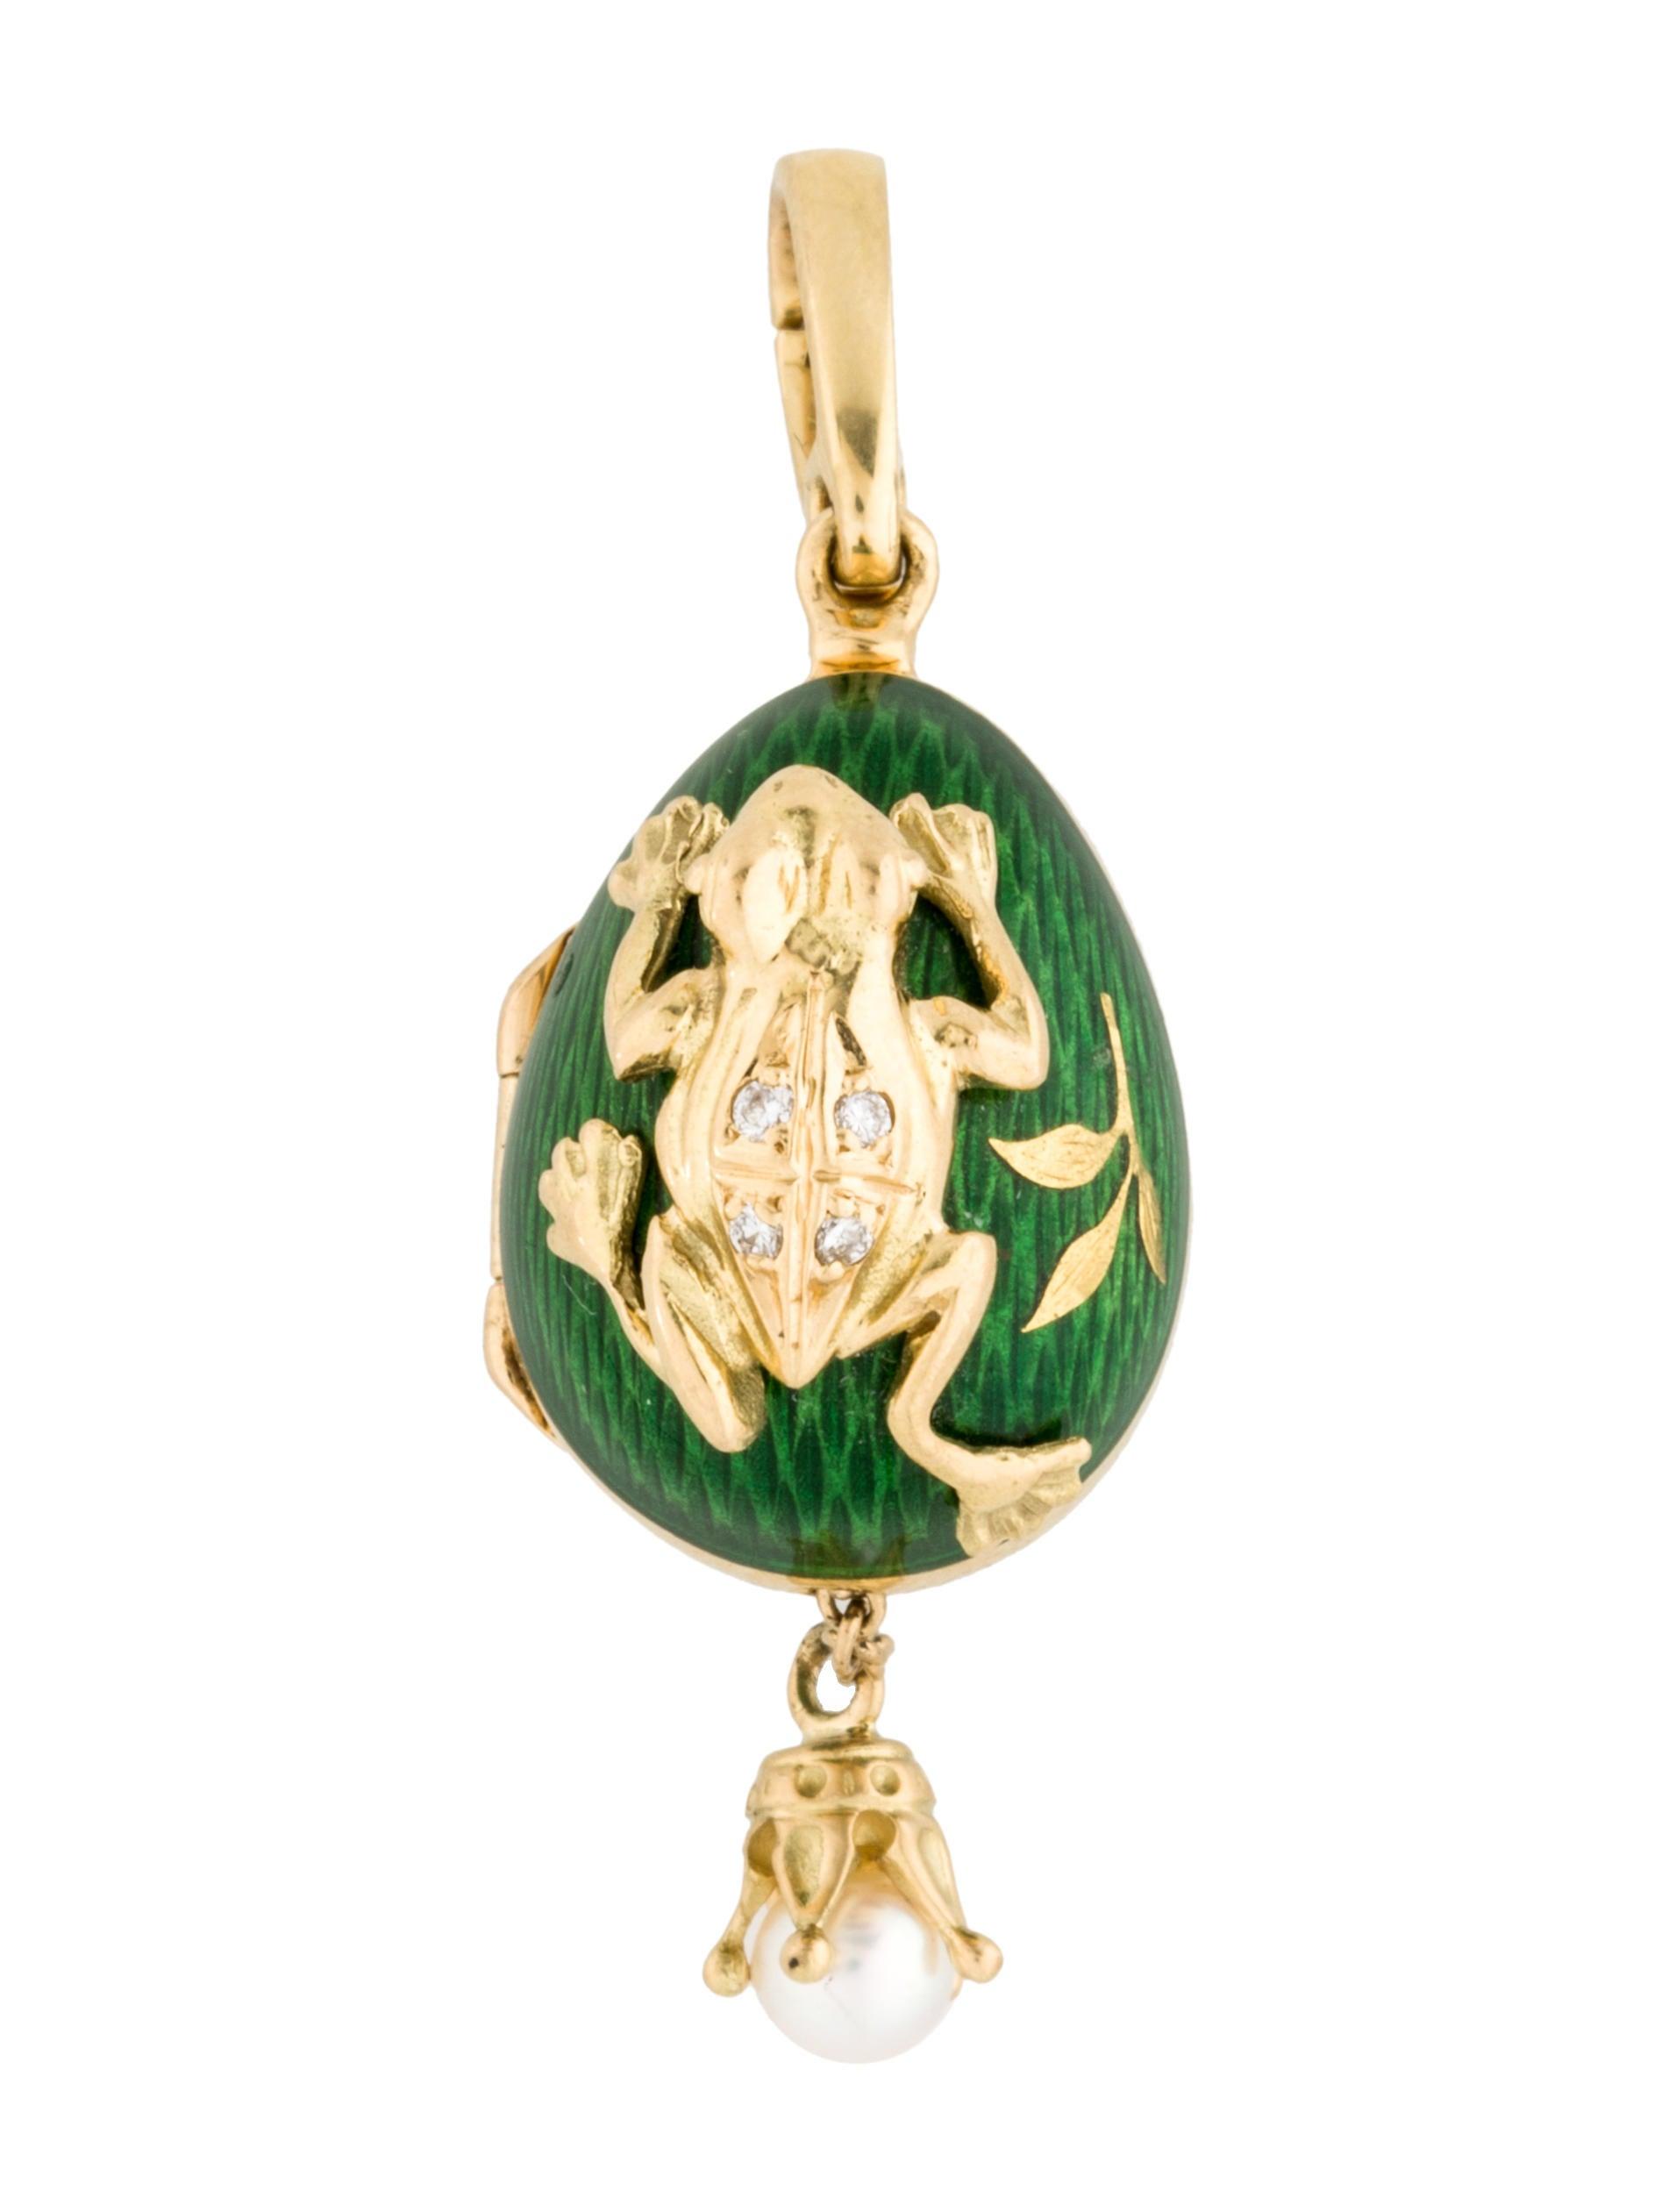 Faberg Frog Enamel Egg Pendant Necklaces FBG20047